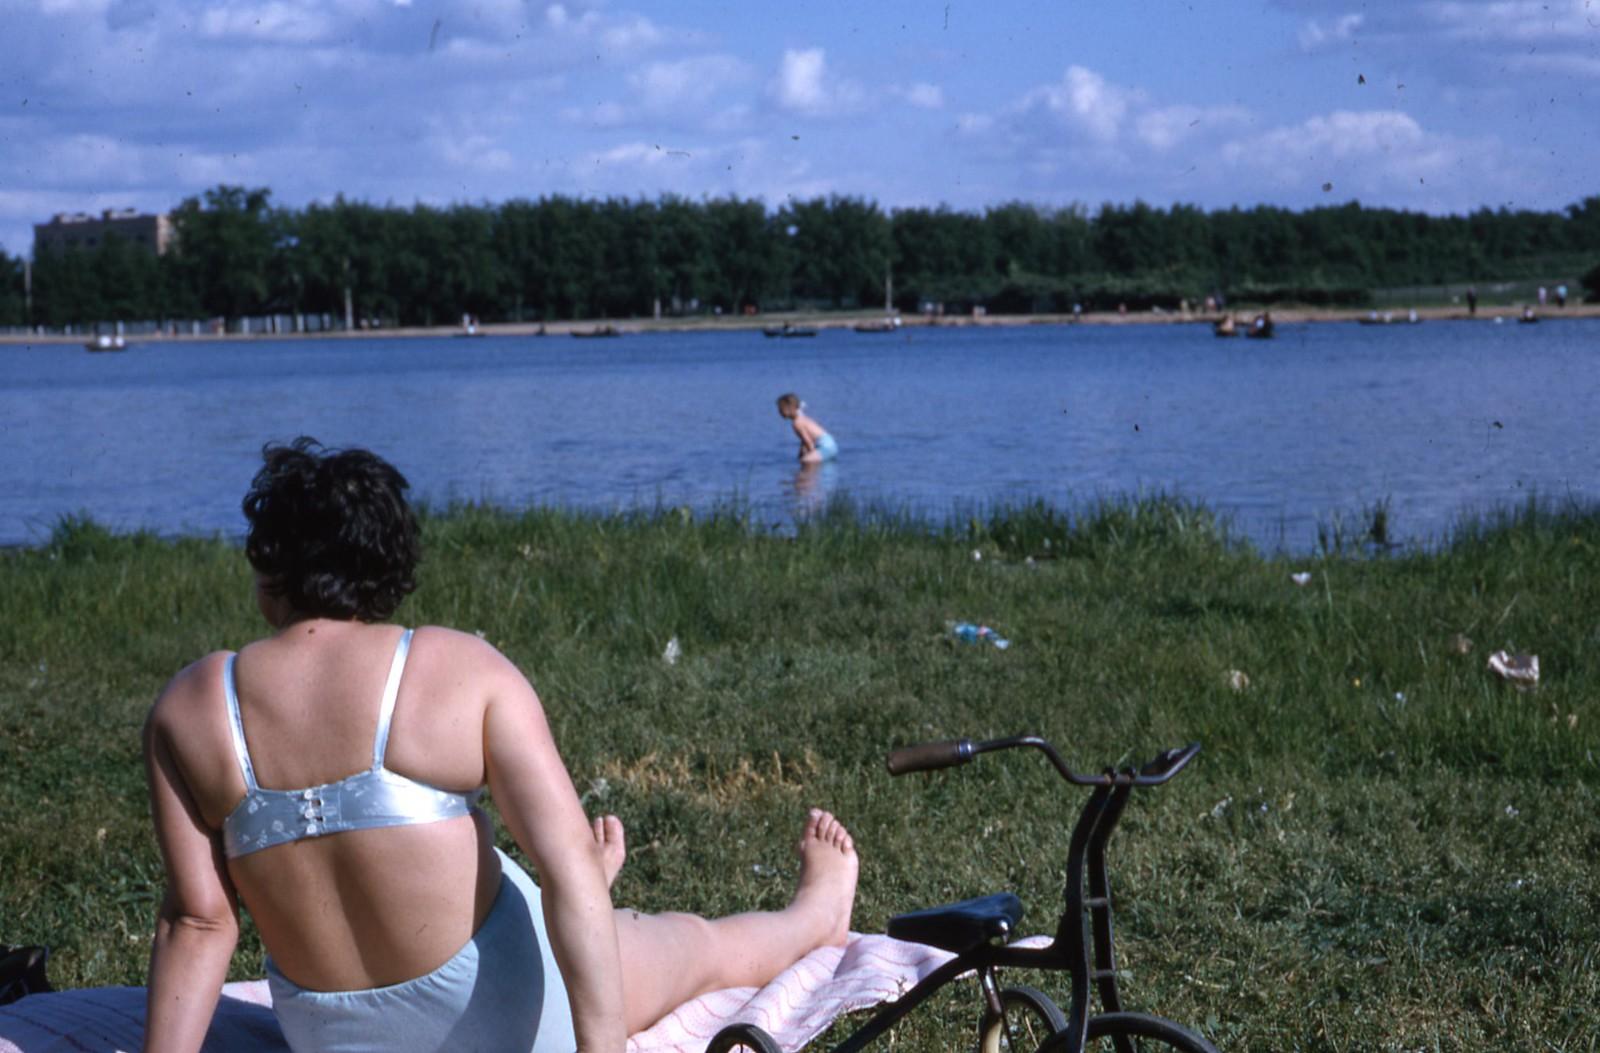 hammond-MA10-Ostankino-people-sunbathing-and-fishing-005